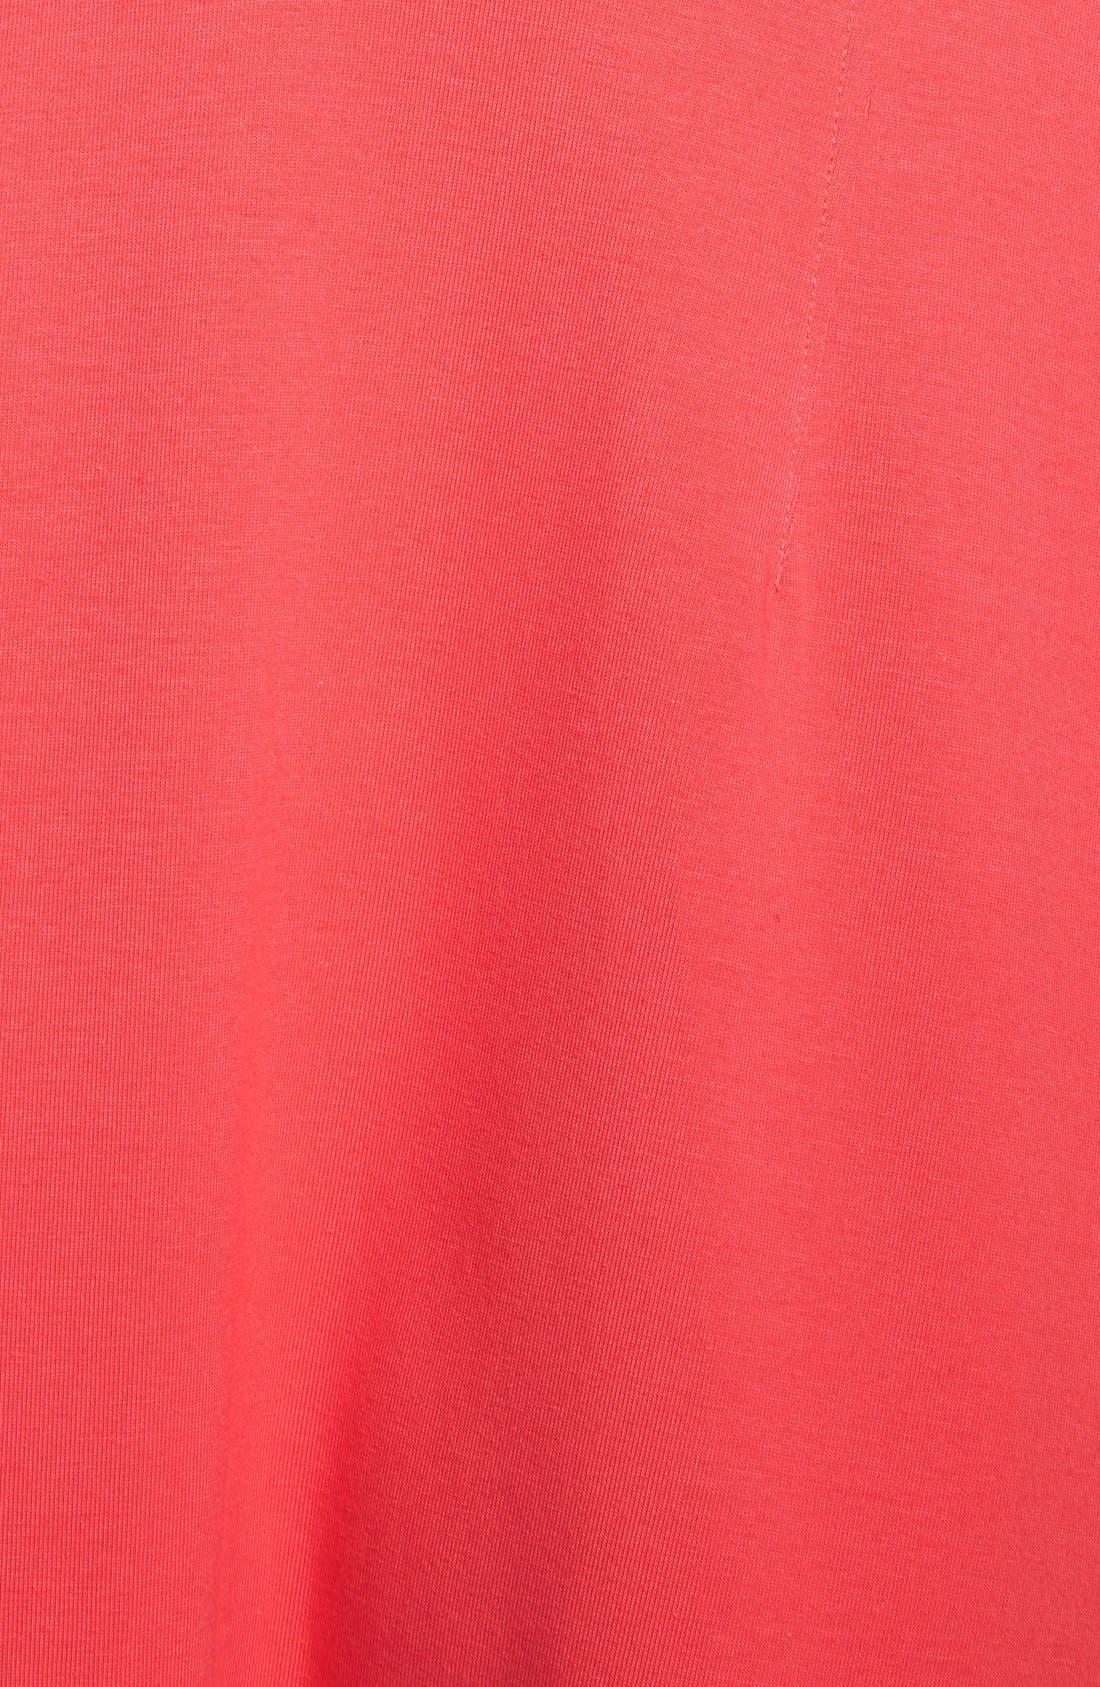 Alternate Image 3  - Eileen Fisher Sleeveless Jersey Dress